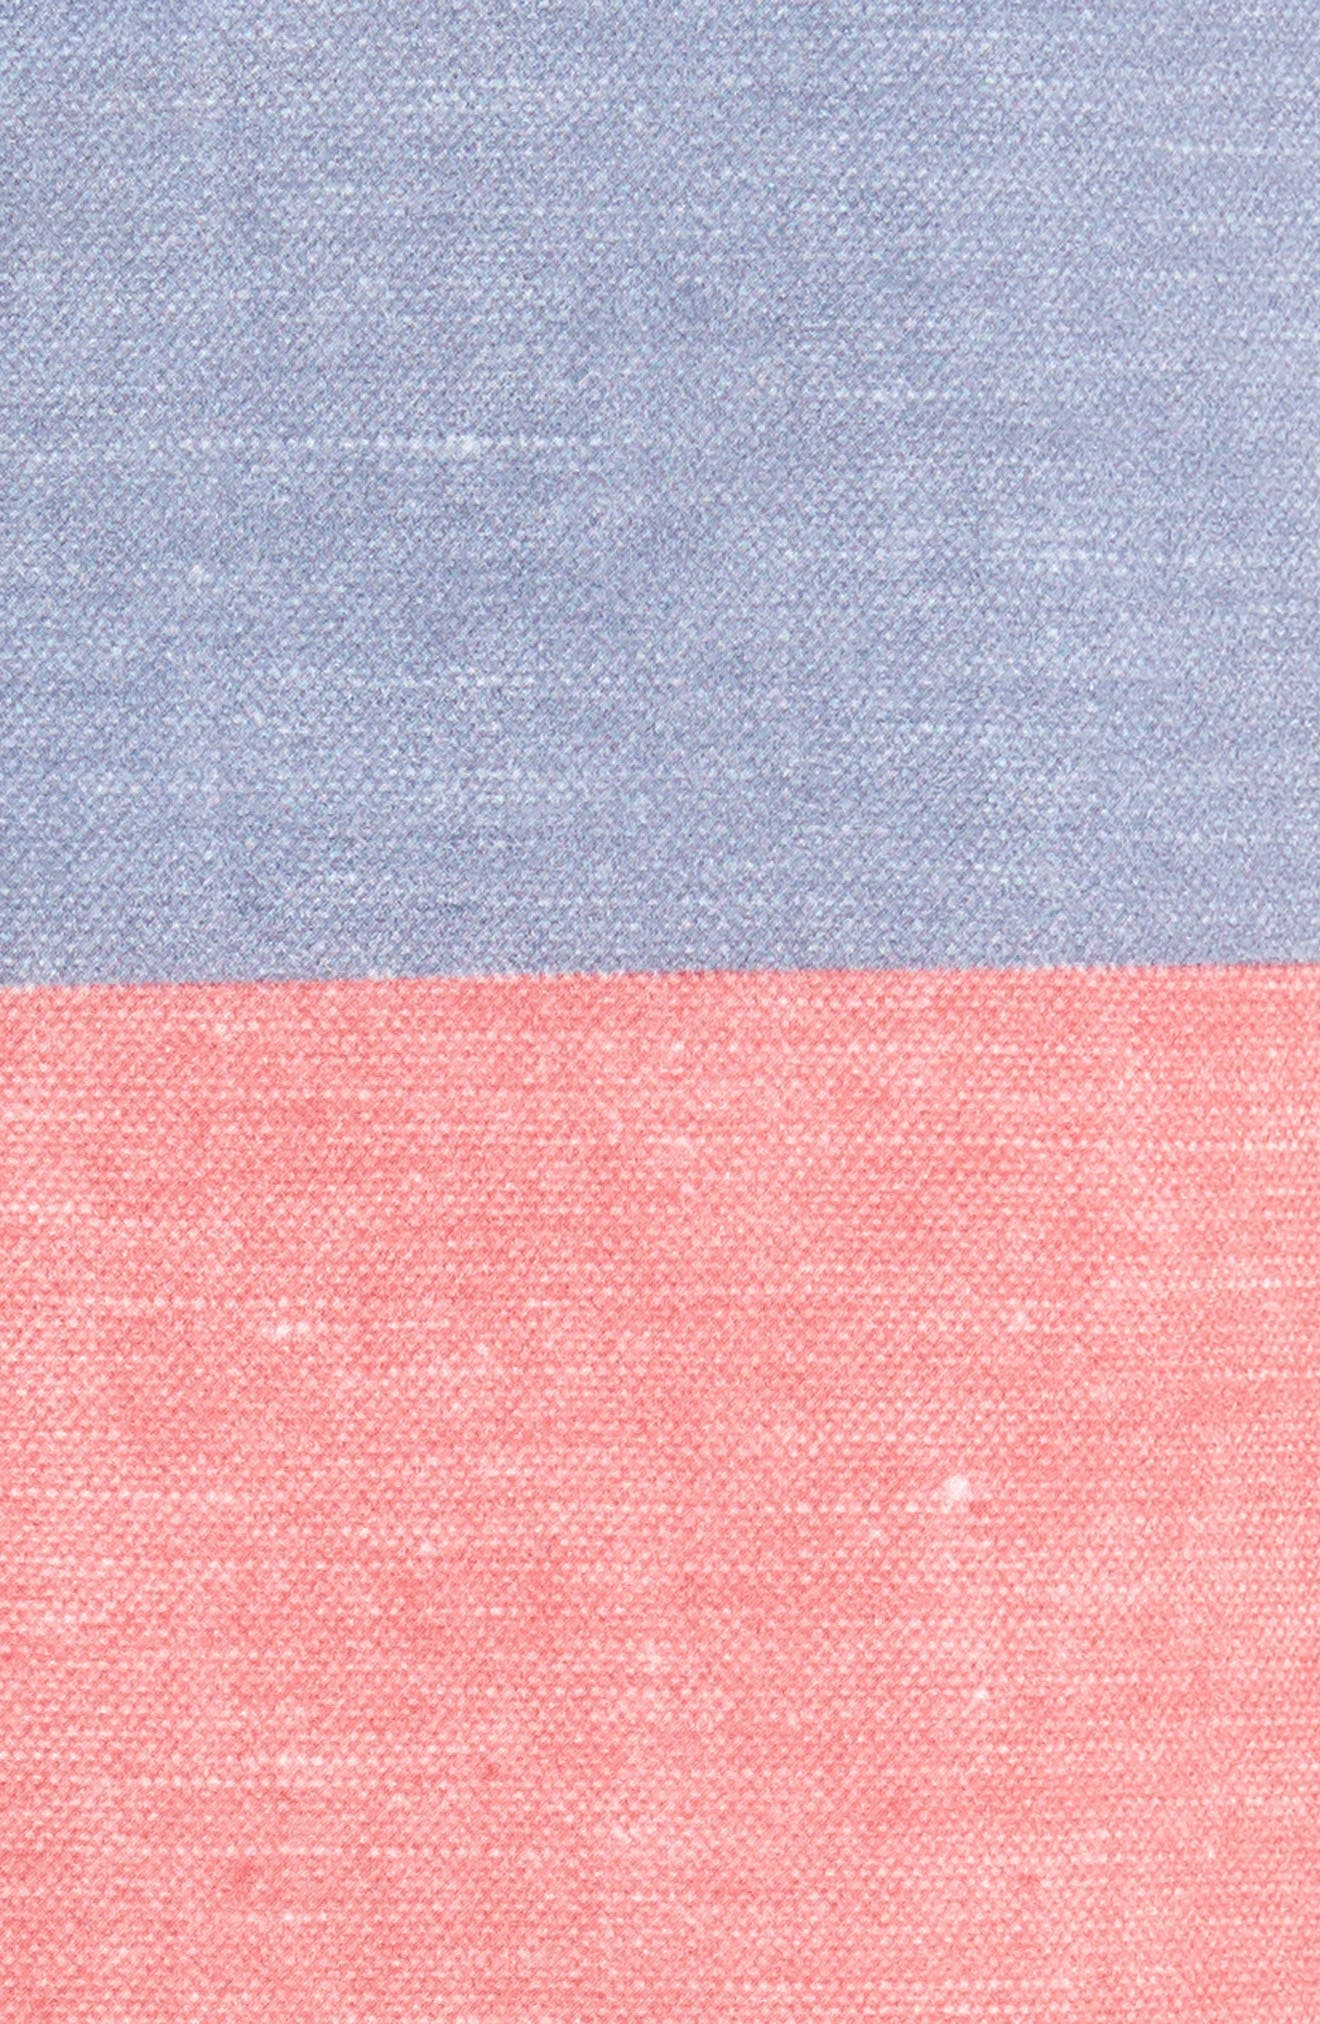 Seegrid Regular Fit Board Shorts,                             Alternate thumbnail 10, color,